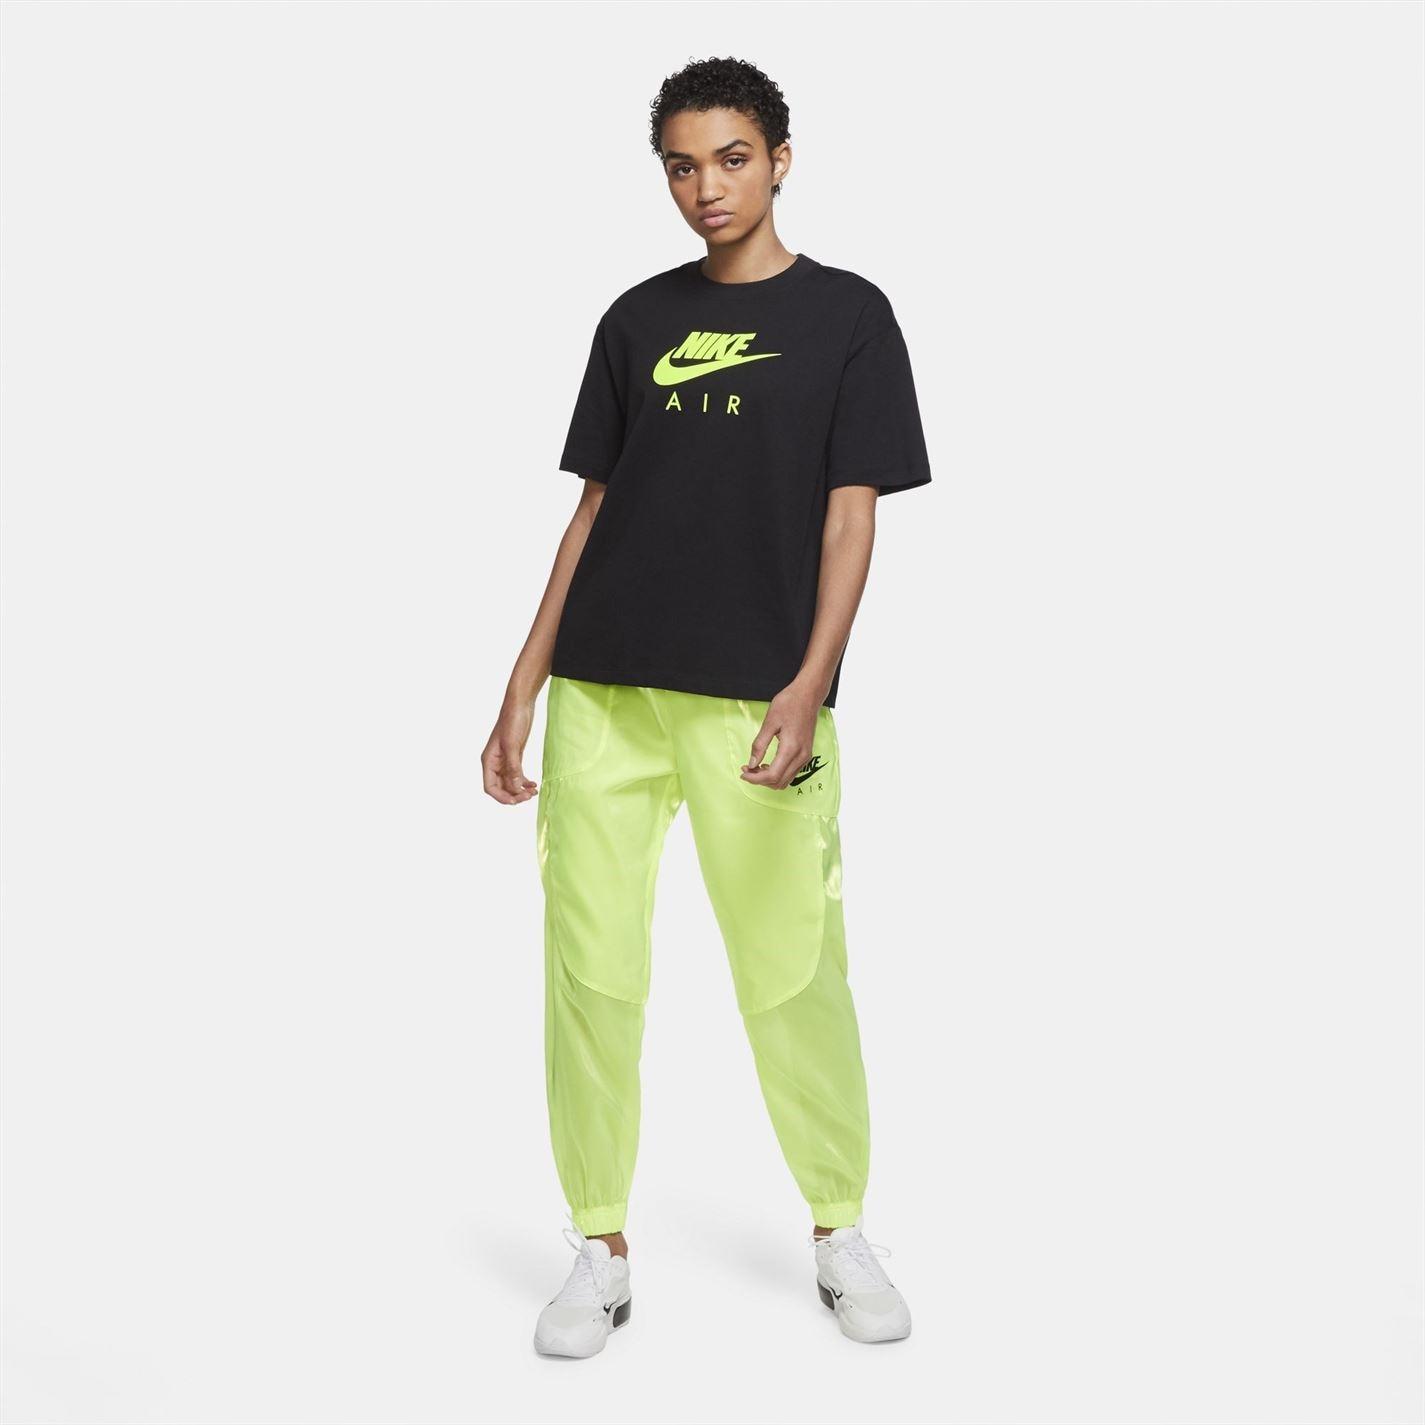 Dámske tričko Nike Air